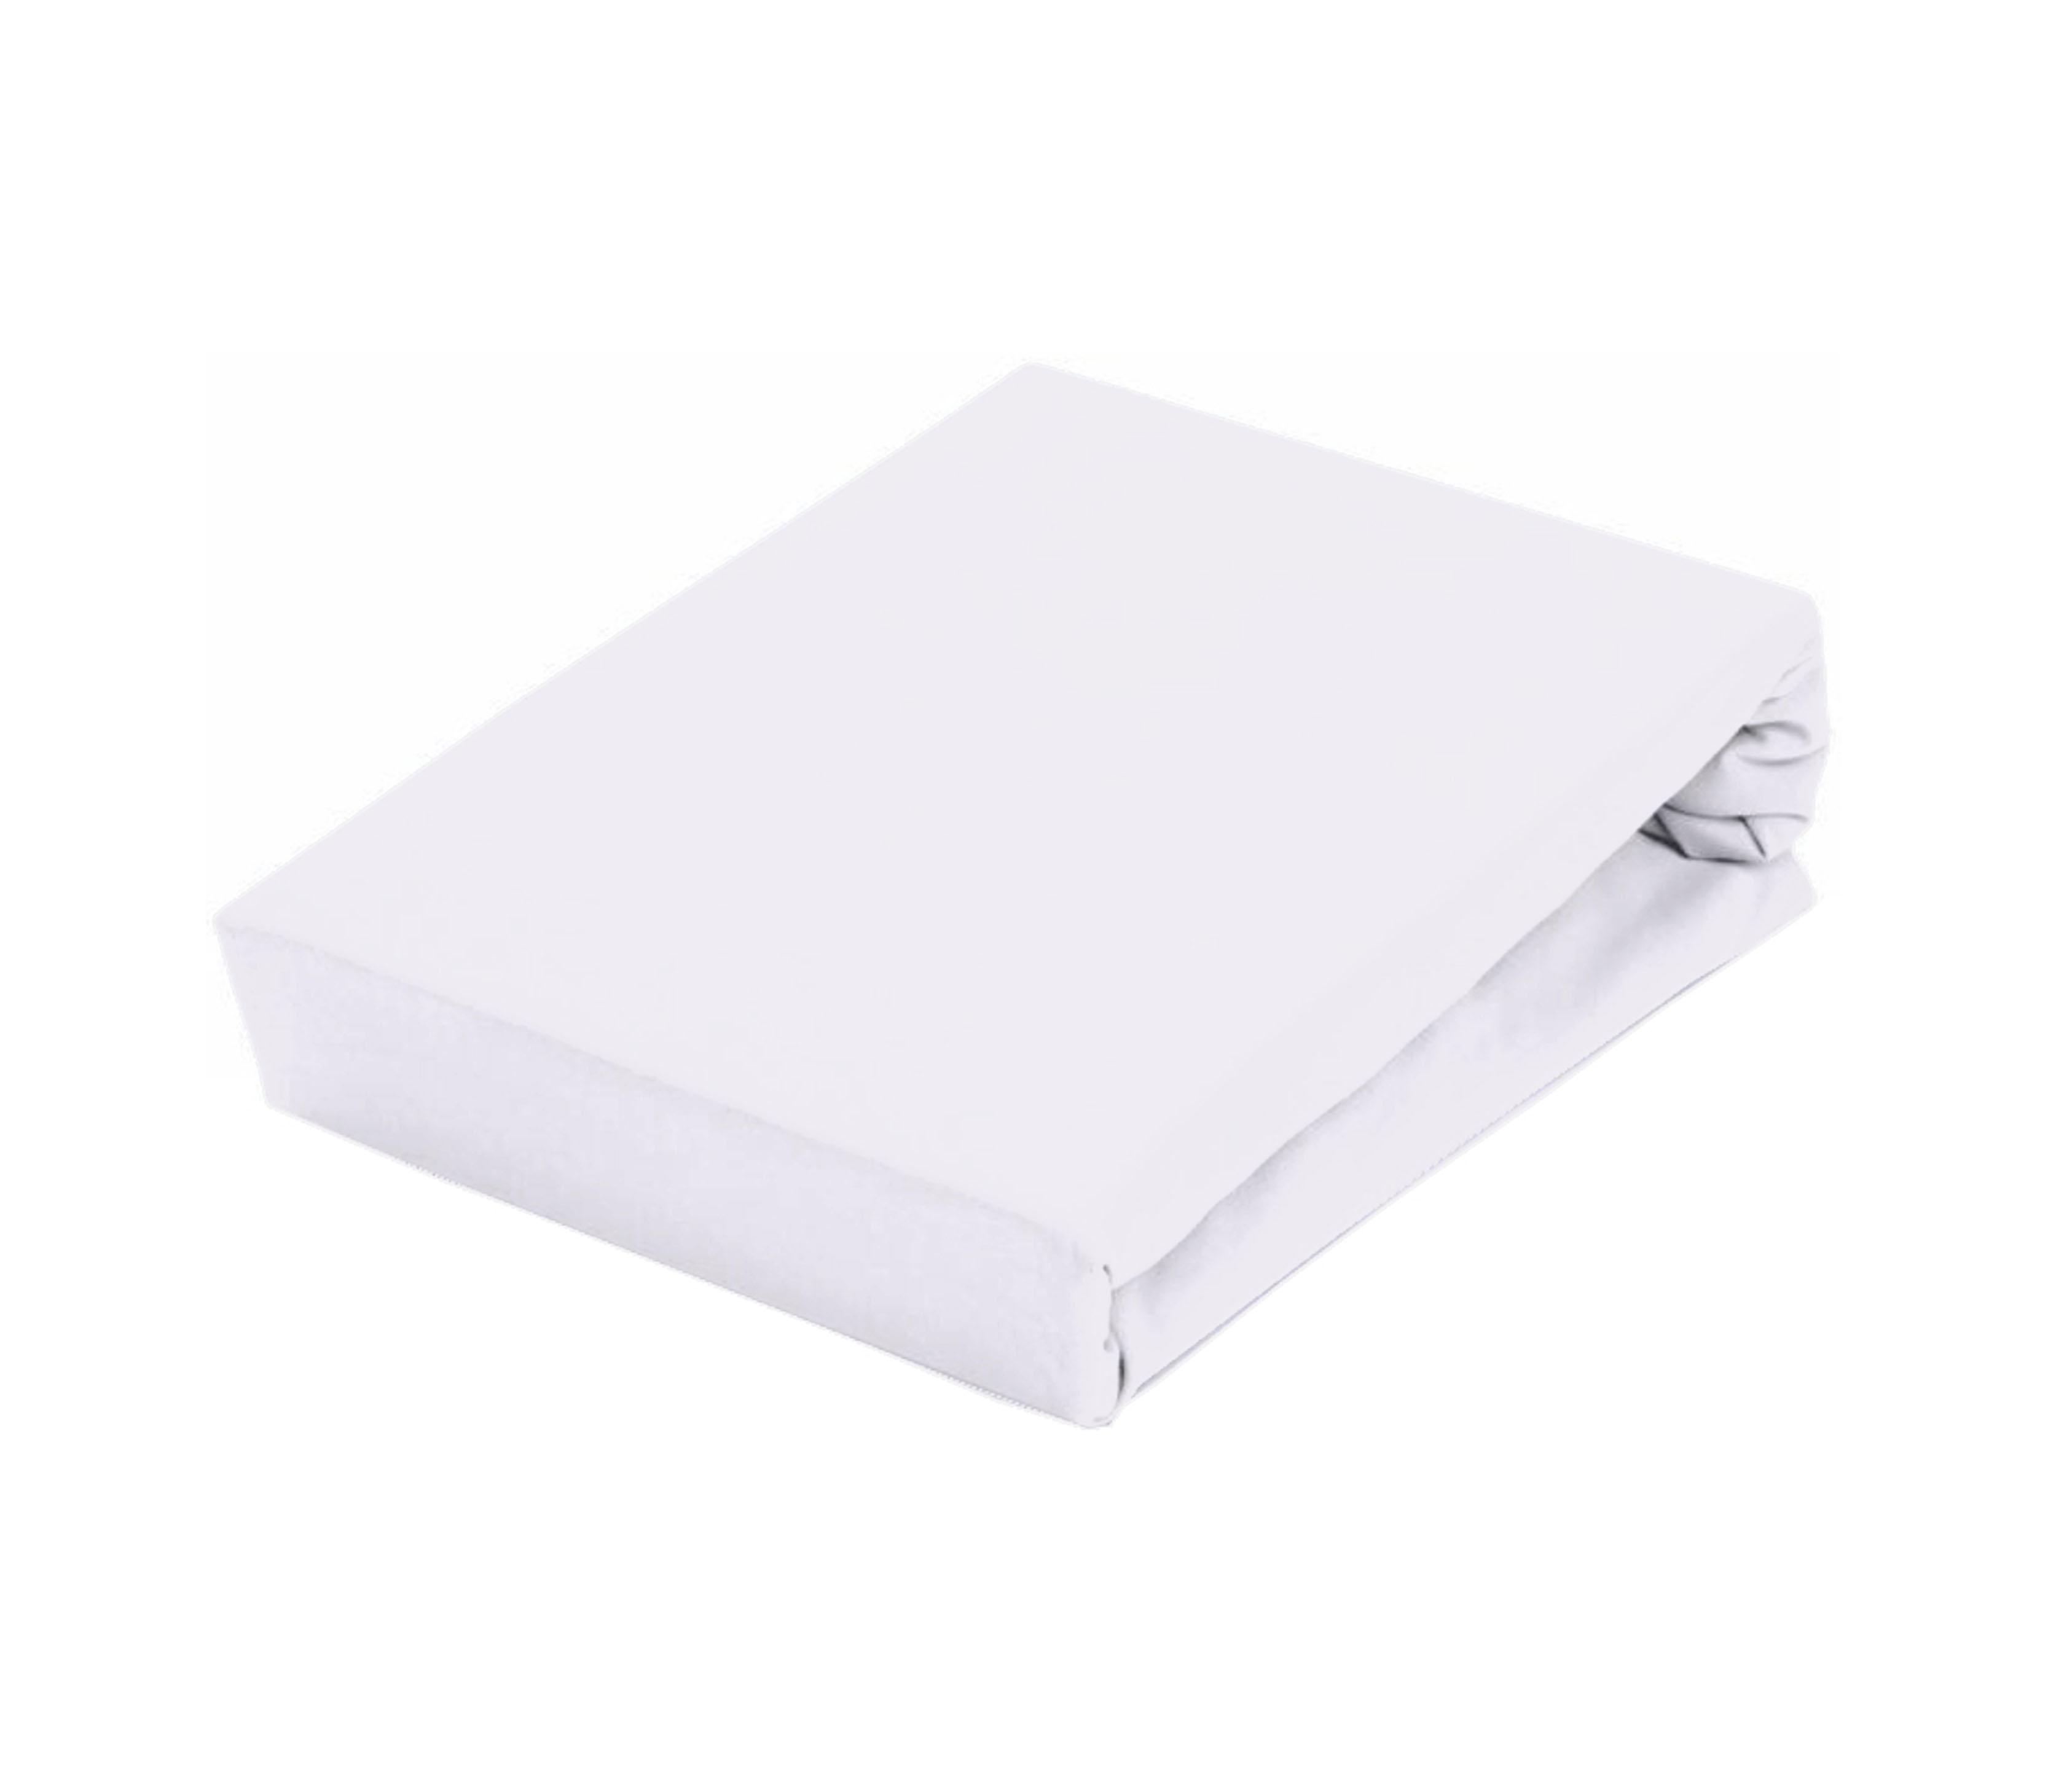 Aga Prostěradlo JERSEY 140x200 cm  Barva prostěradla: Bílá